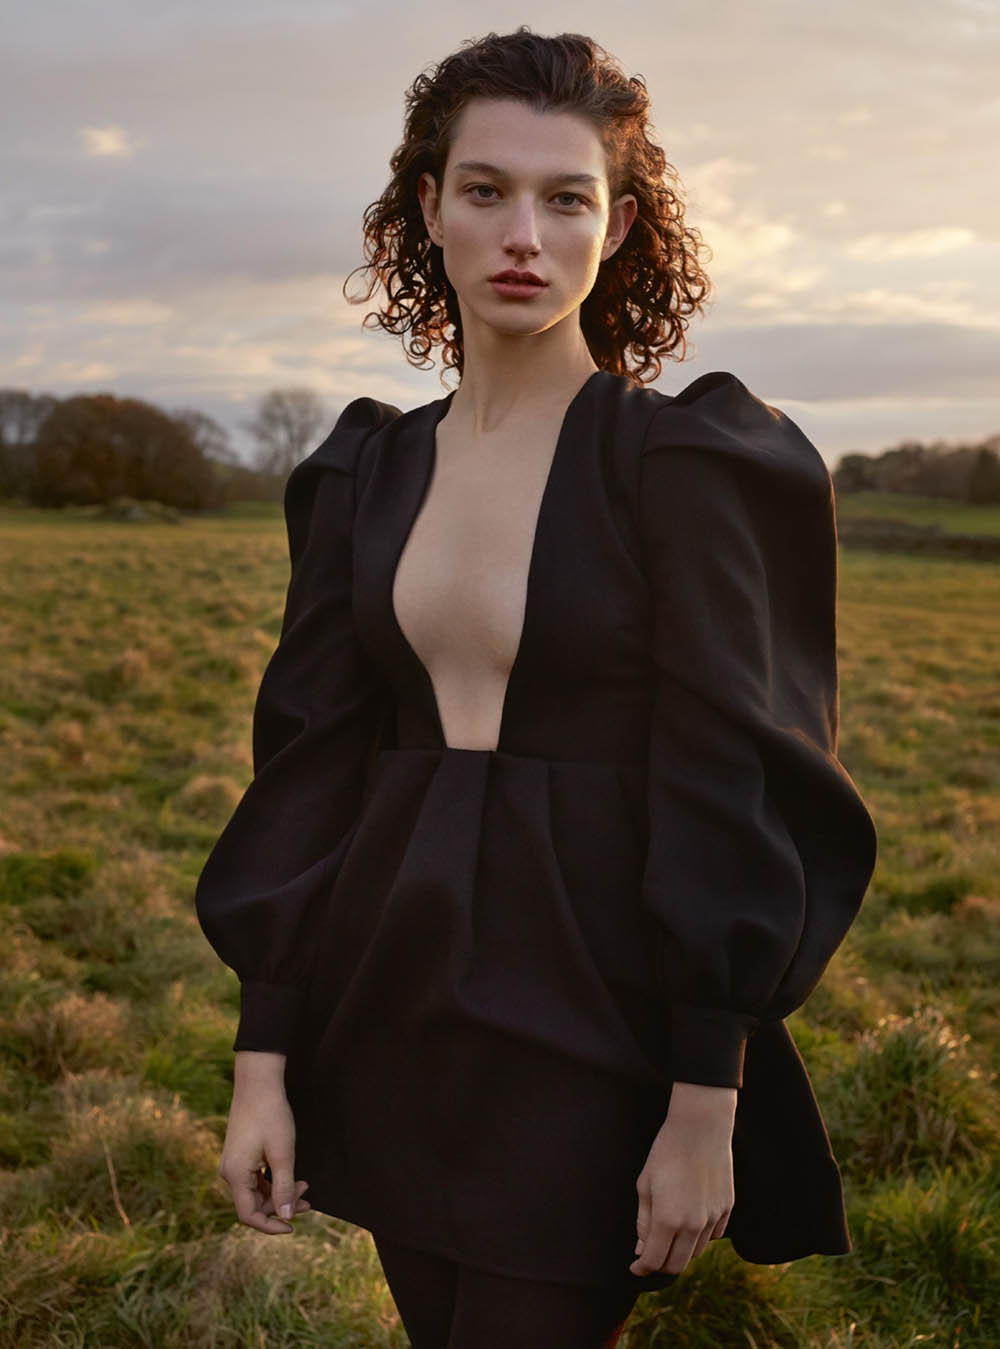 McKenna Hellam by Agata Pospieszynska for Harper's Bazaar UK March 2020